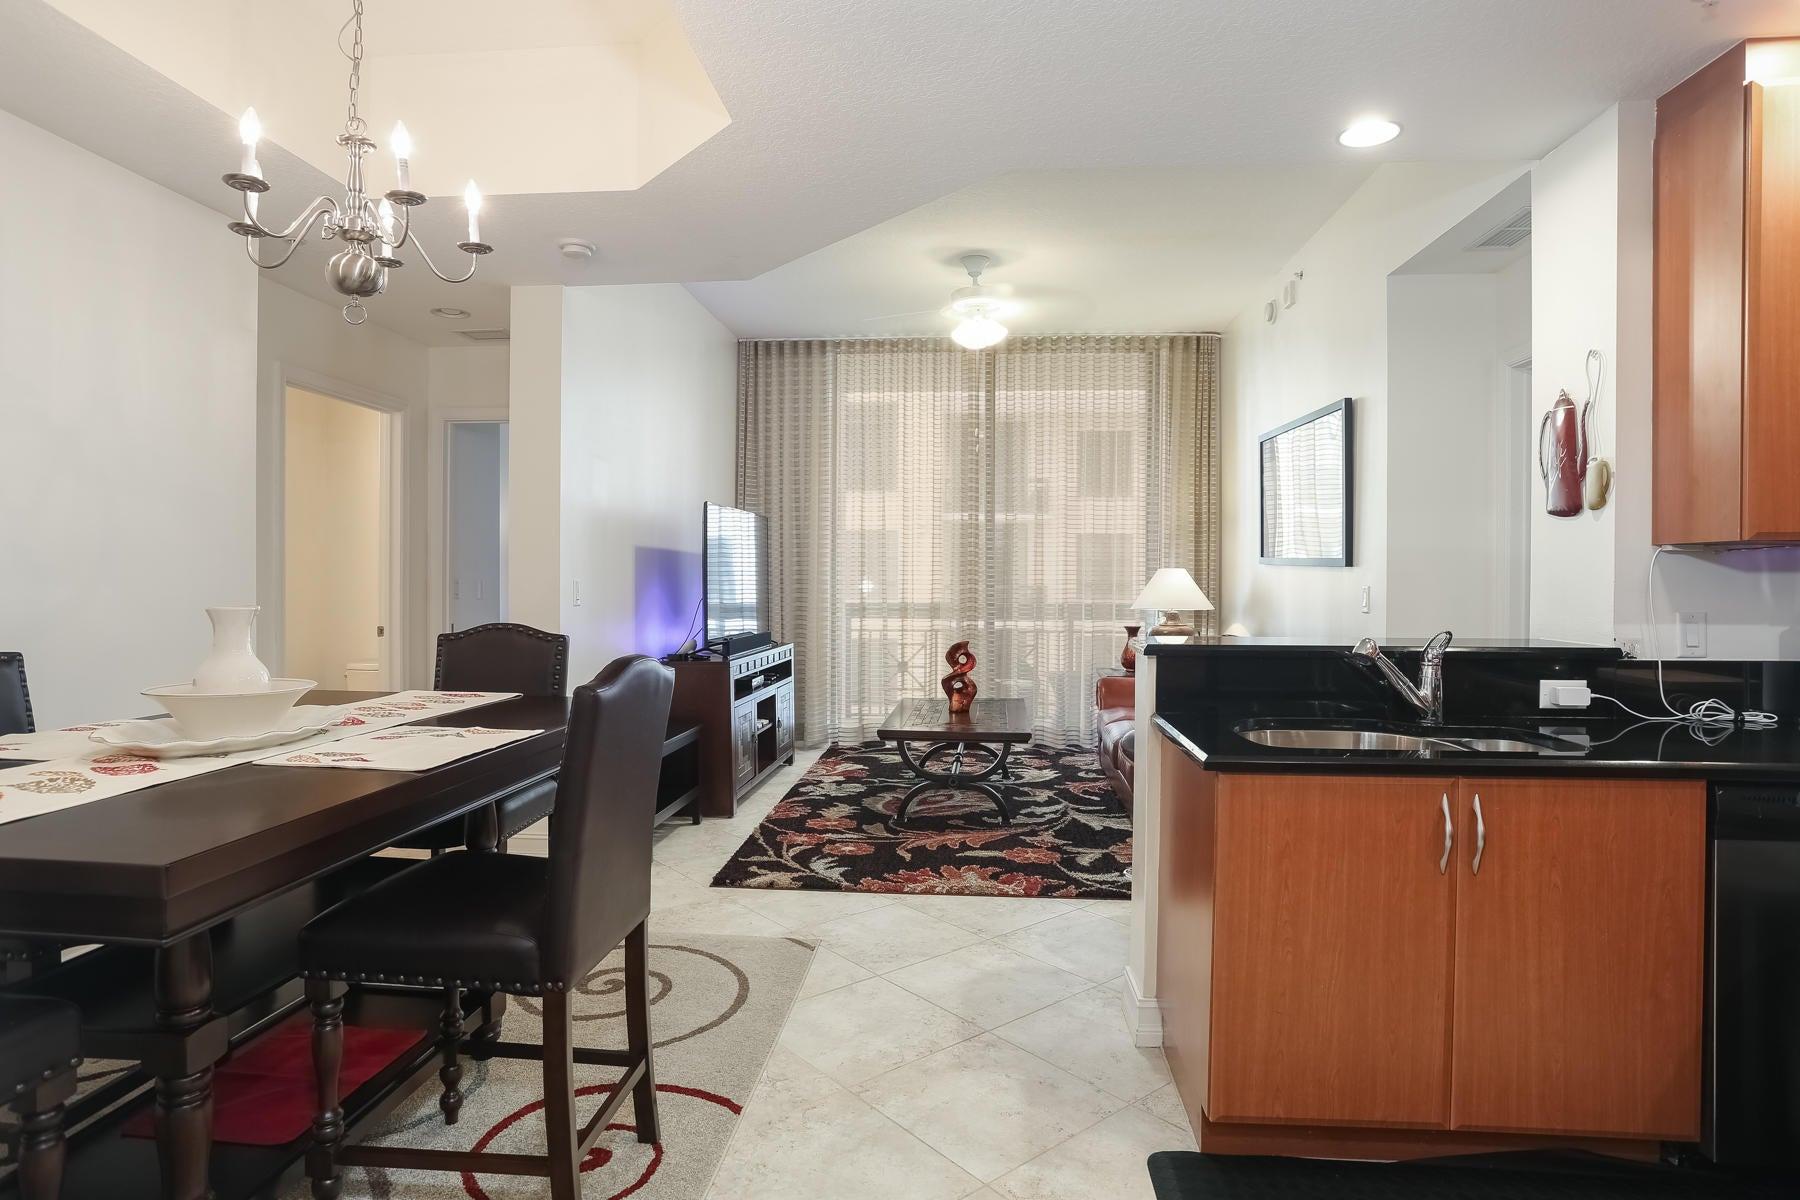 701 S Olive Avenue 1414 West Palm Beach, FL 33401